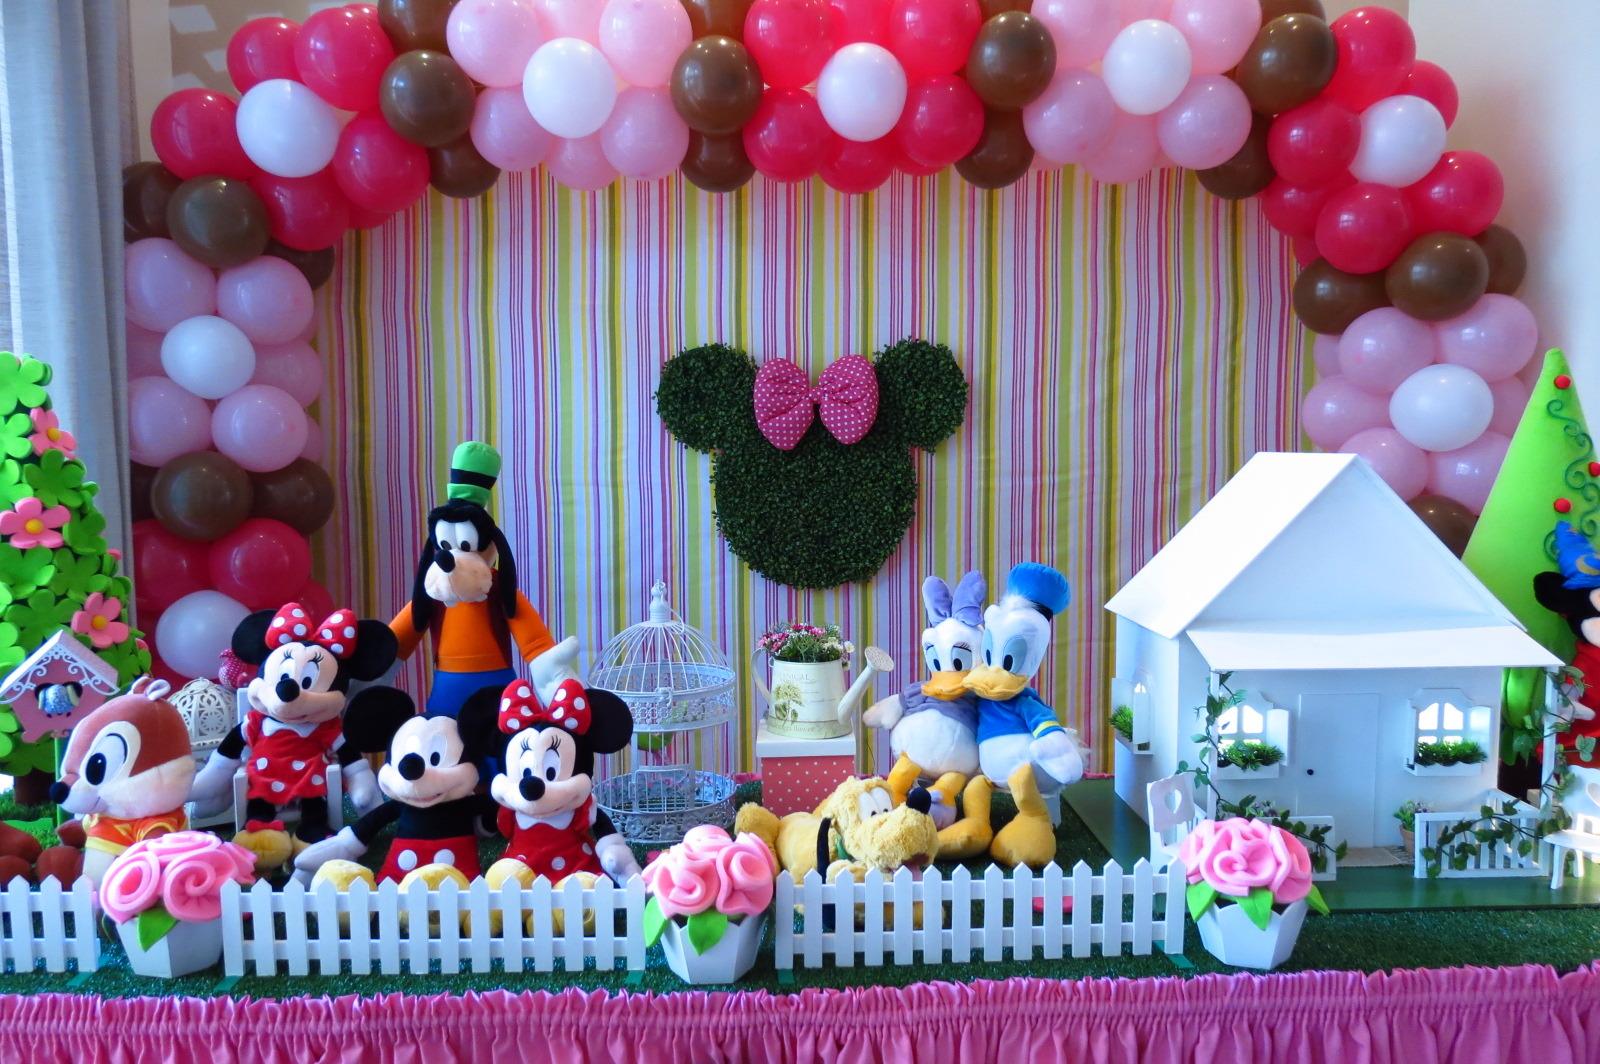 decoracao festa minnie rosa : decoracao festa minnie rosa:da Minnie – Rosa Decoração da Minnie – Rosa Decoração da Minnie